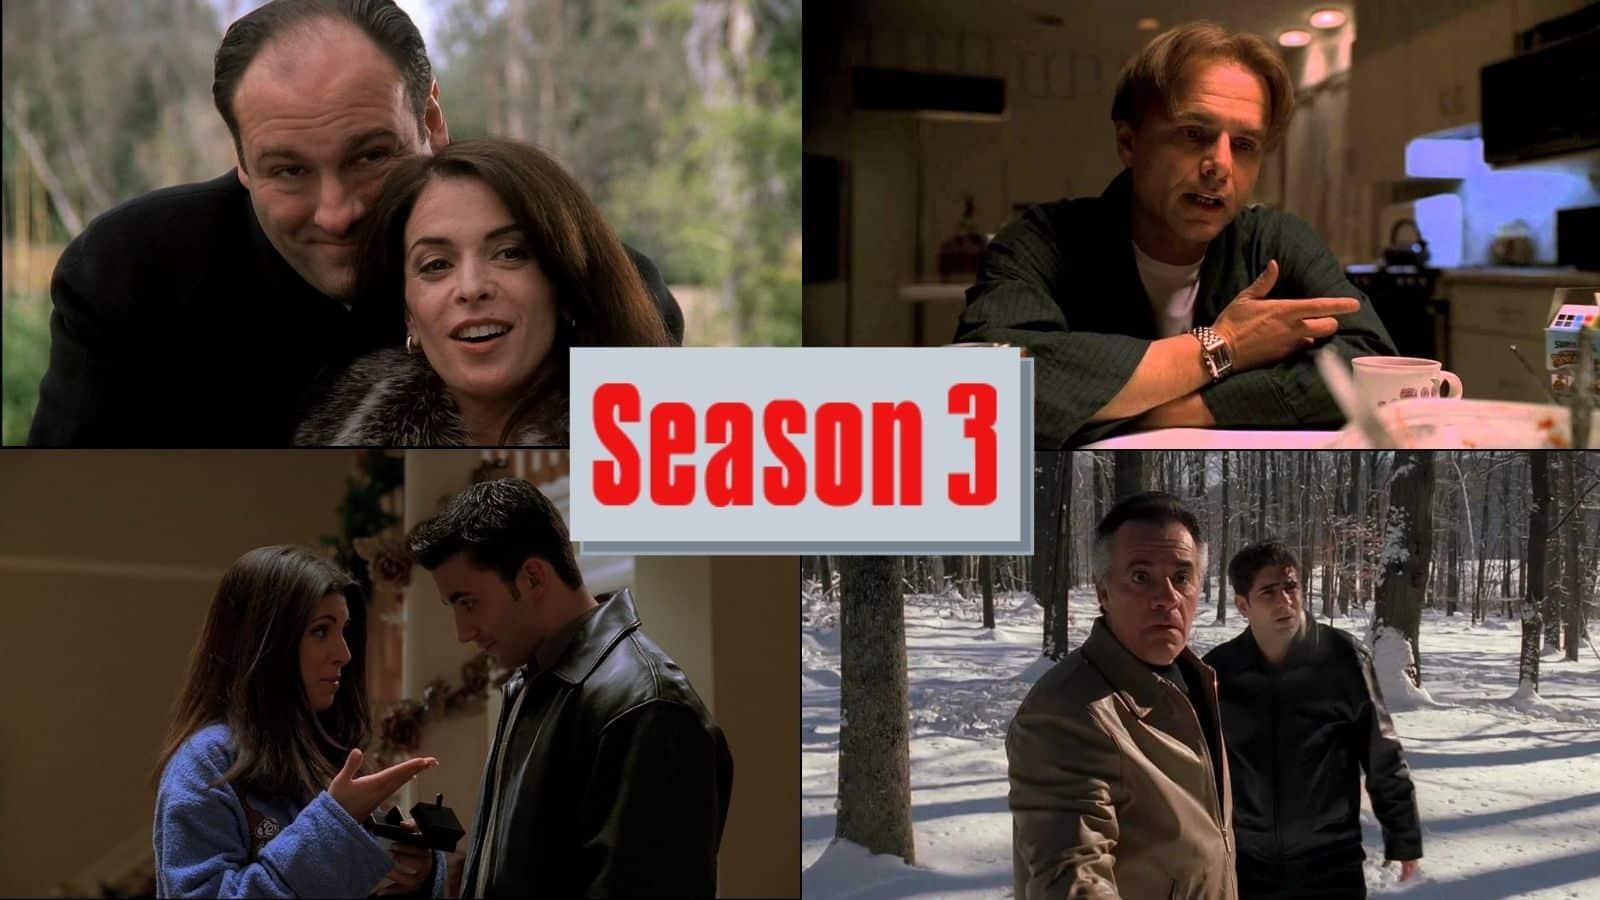 Sopranos season 3 trivia cover image